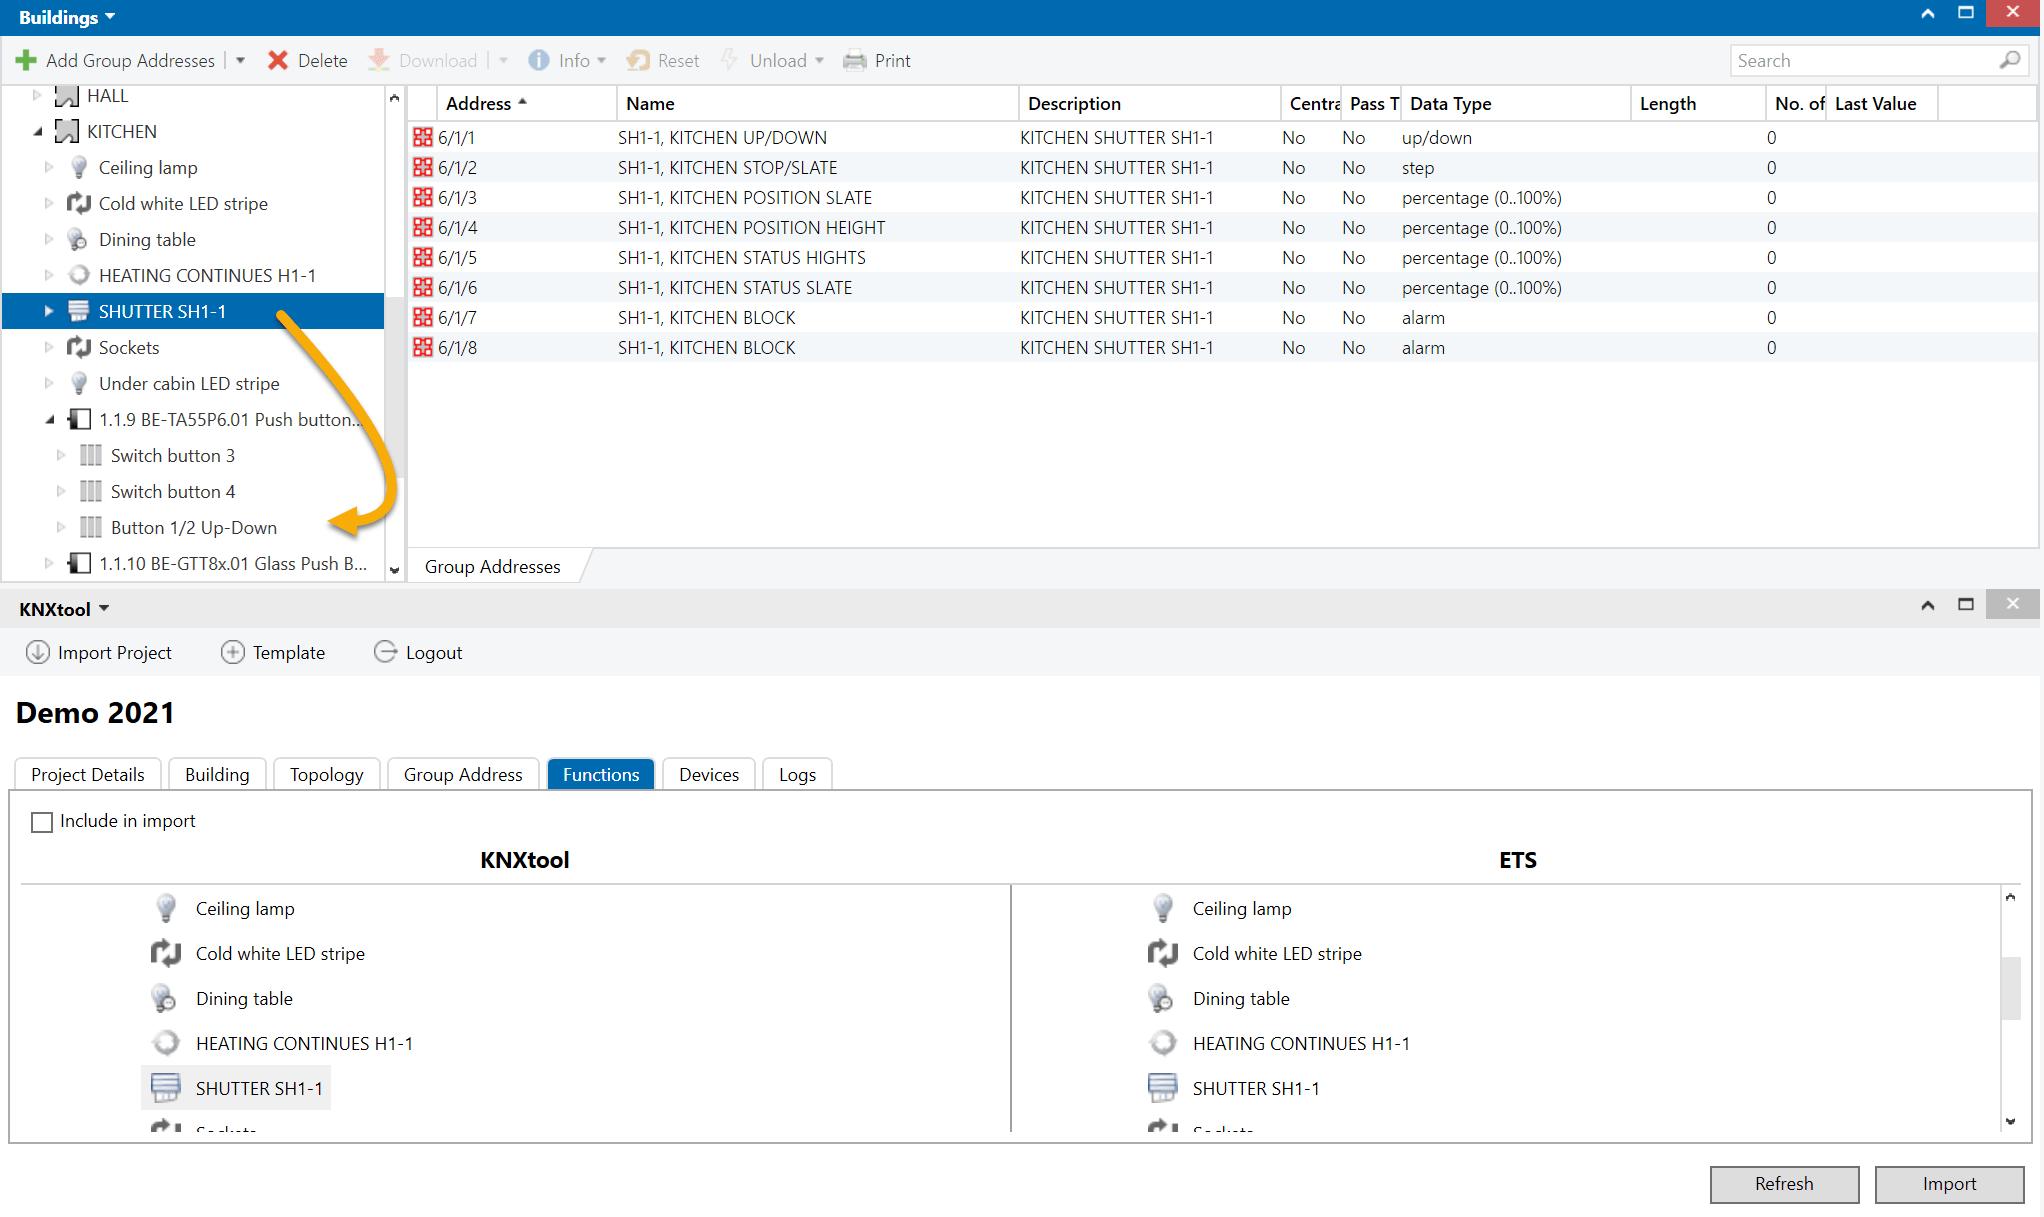 IoT functions in ETS